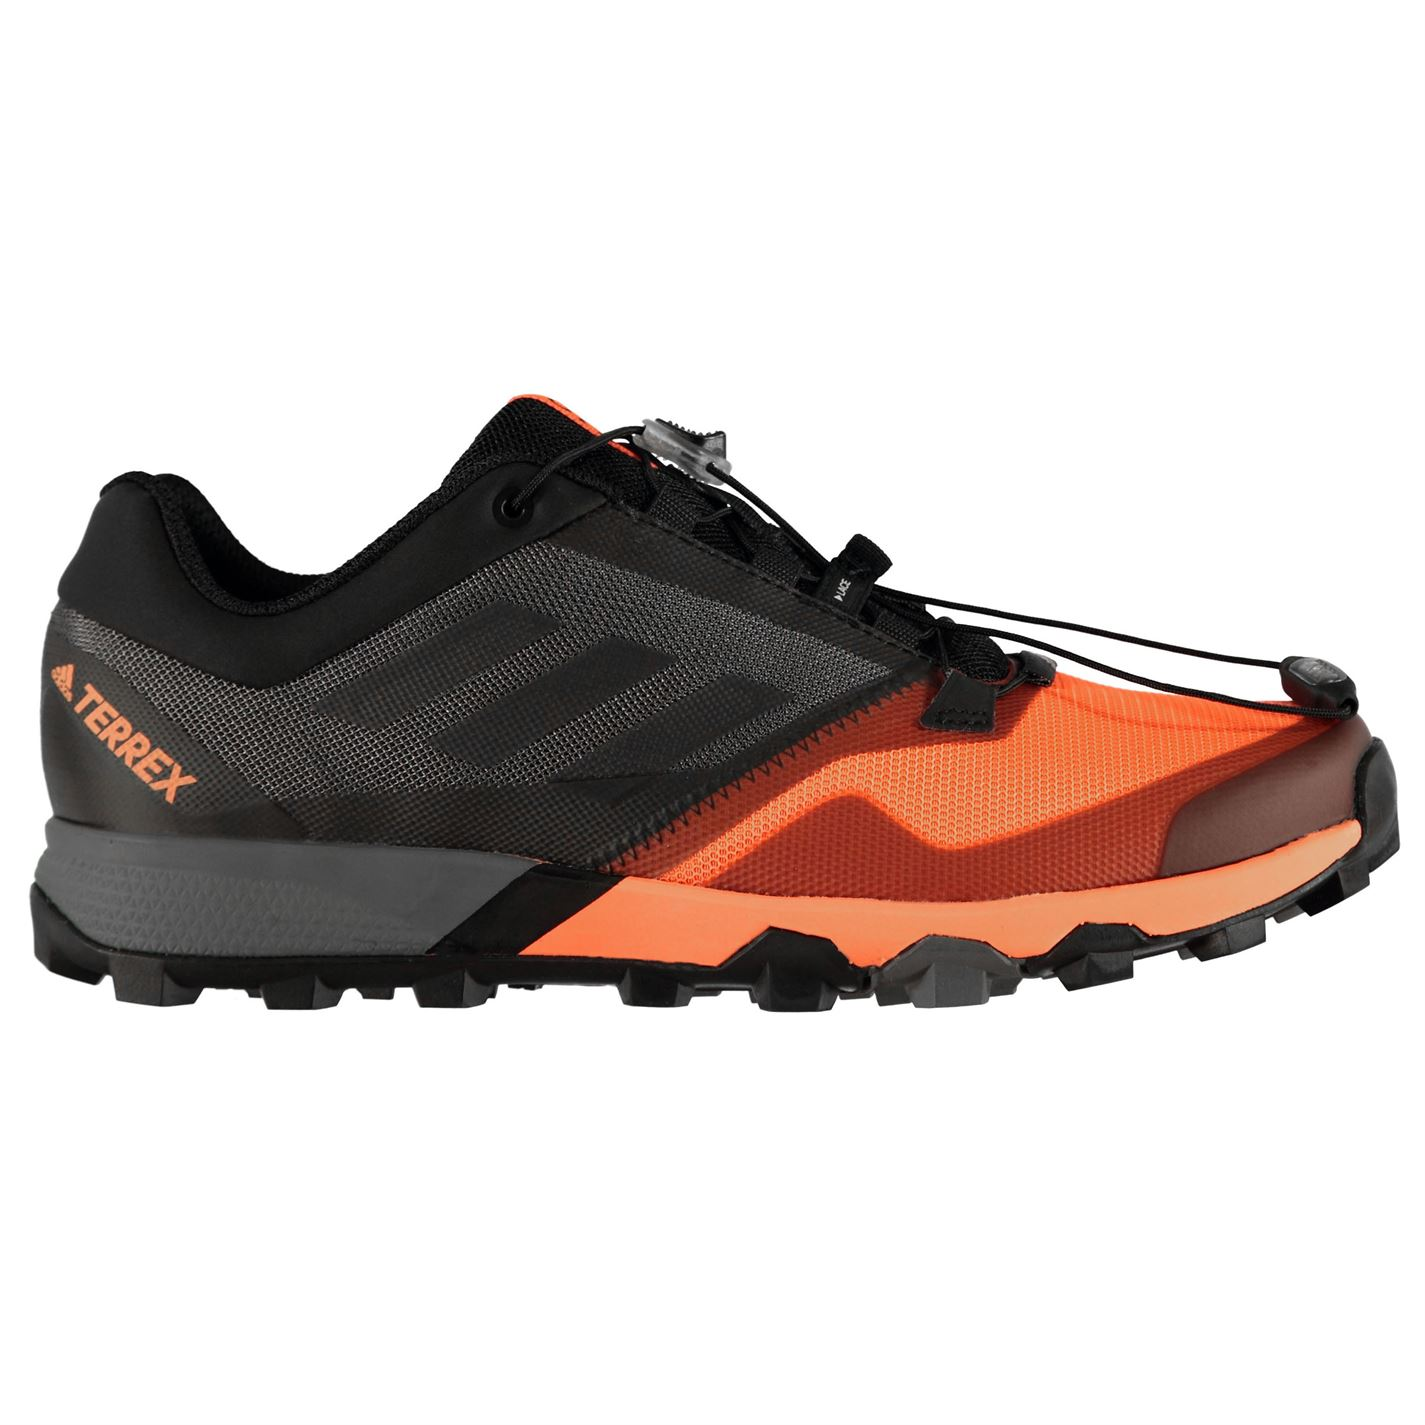 boty adidas Trail Maker pánské Running Shoes Black Orange - Glami.sk 0890fab8a2f